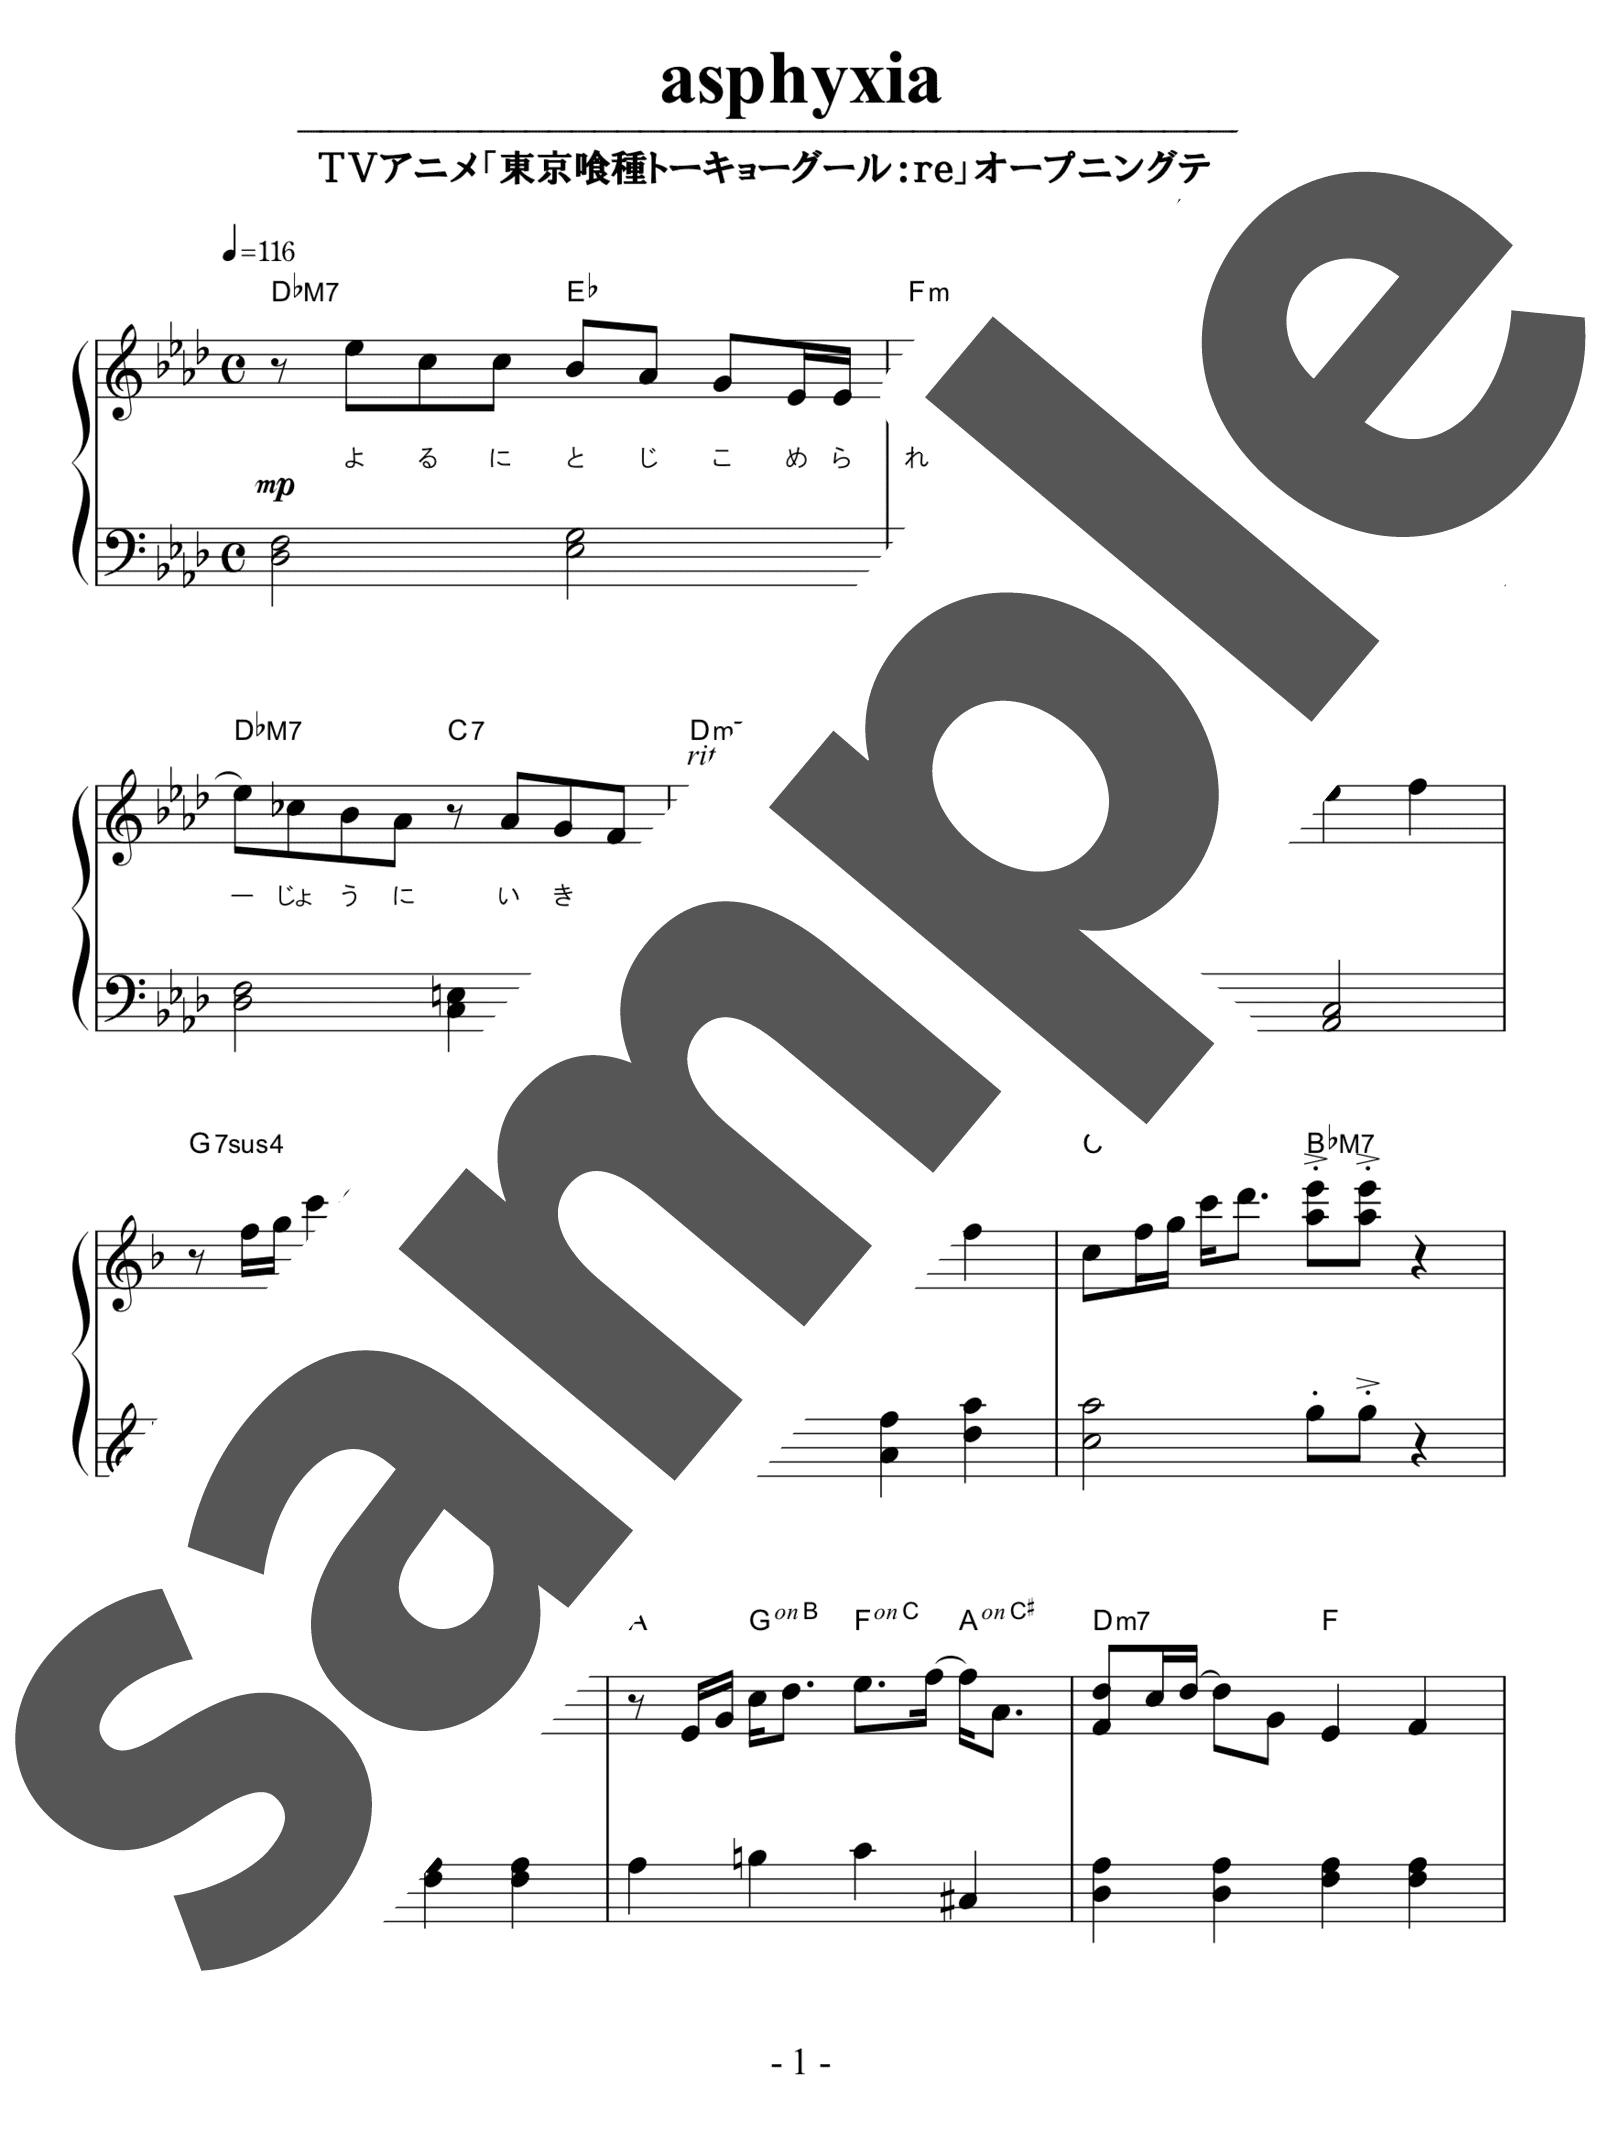 「asphyxia」のサンプル楽譜